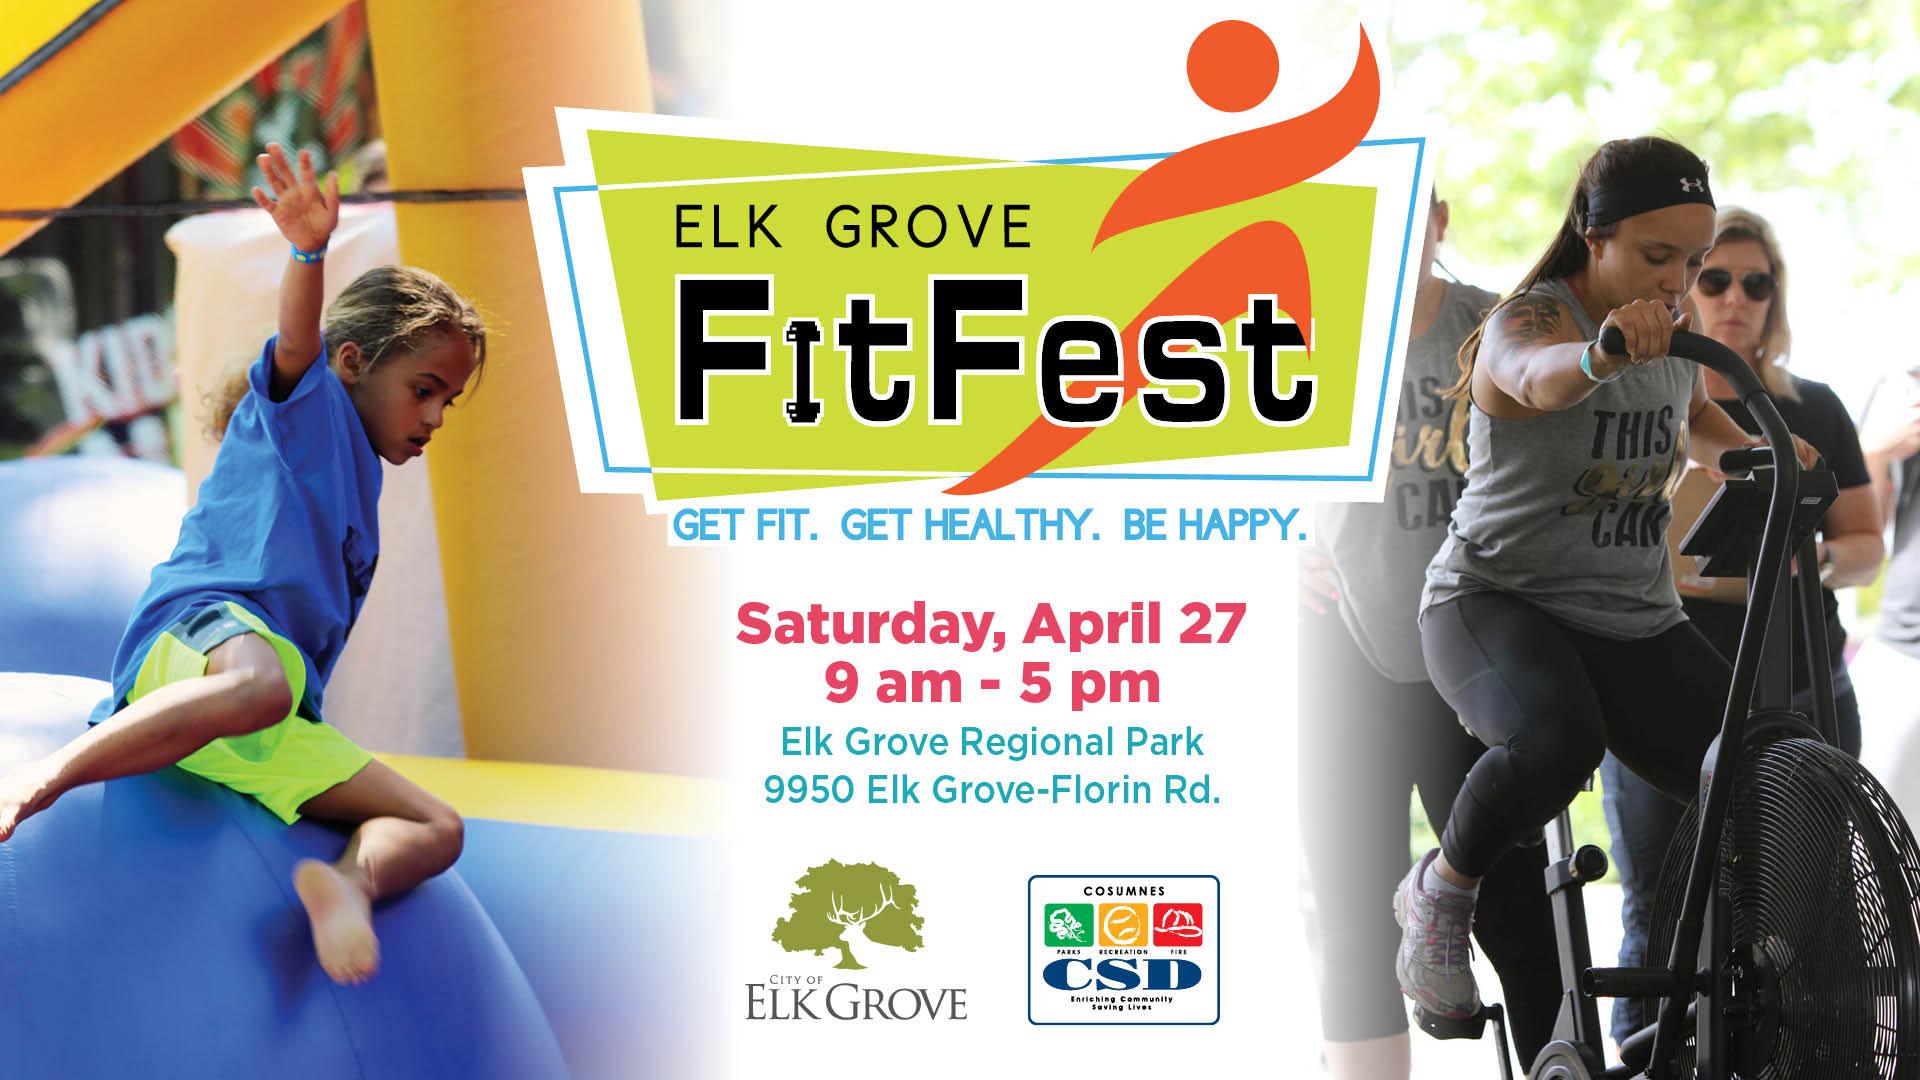 Elk Grove FitFest